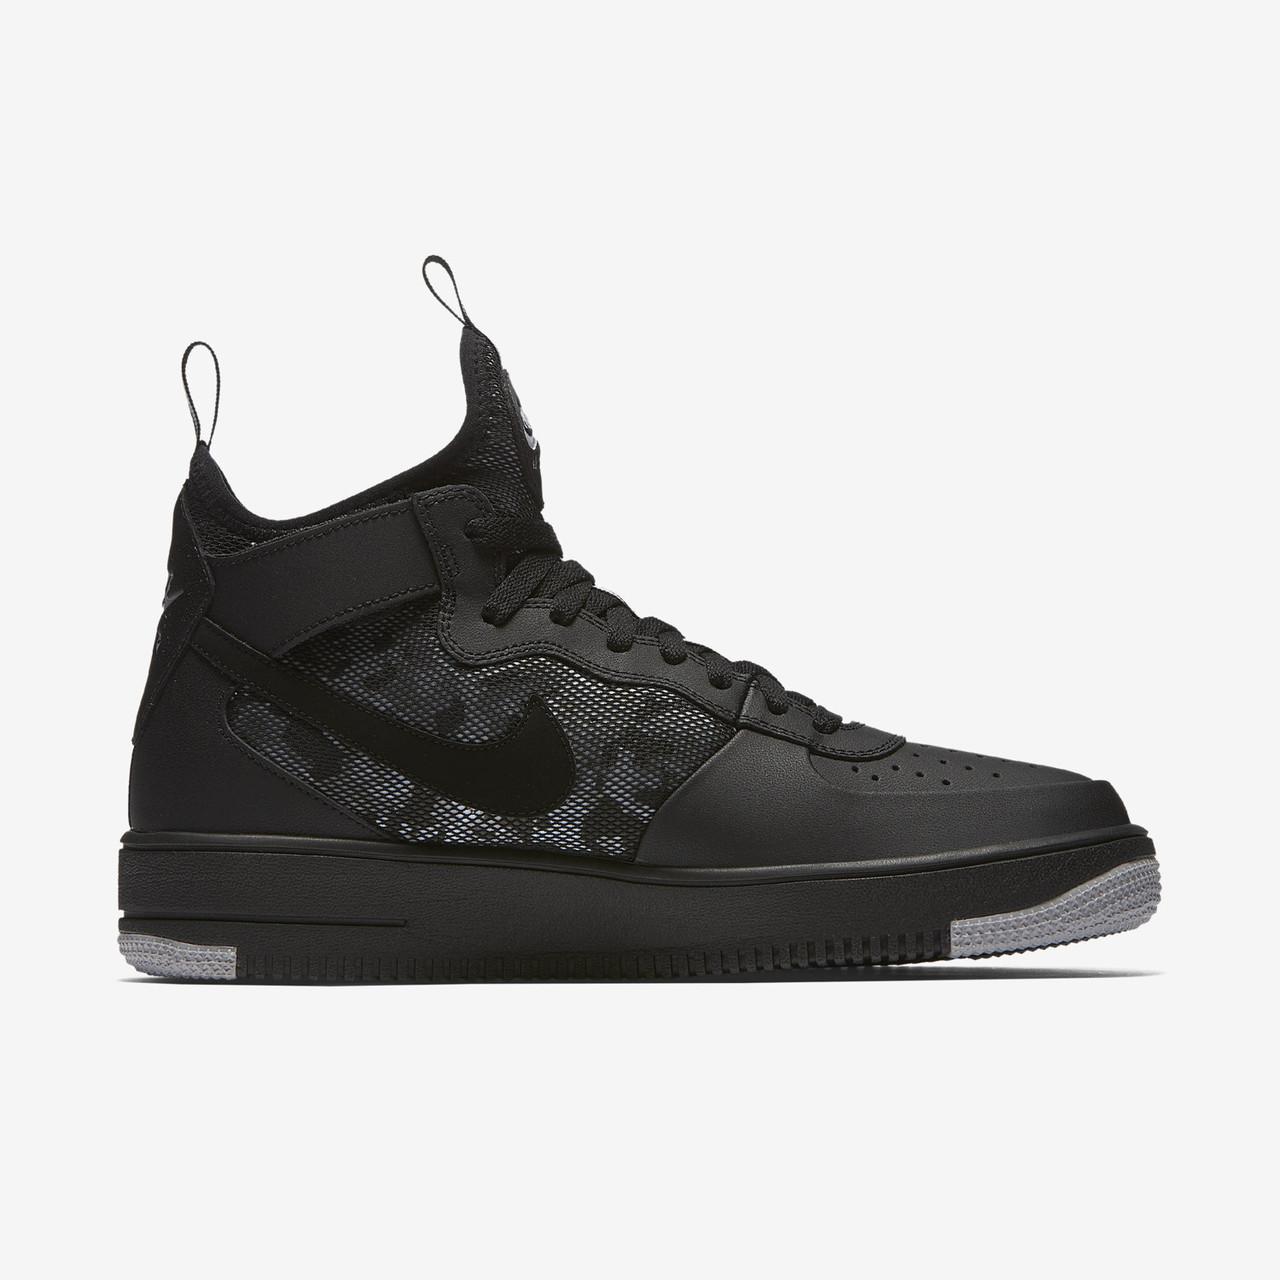 473c1aa8551ec3 Оригинальные Кроссовки Nike Air Force 1 Ultraforce Mid Black / Gray ...